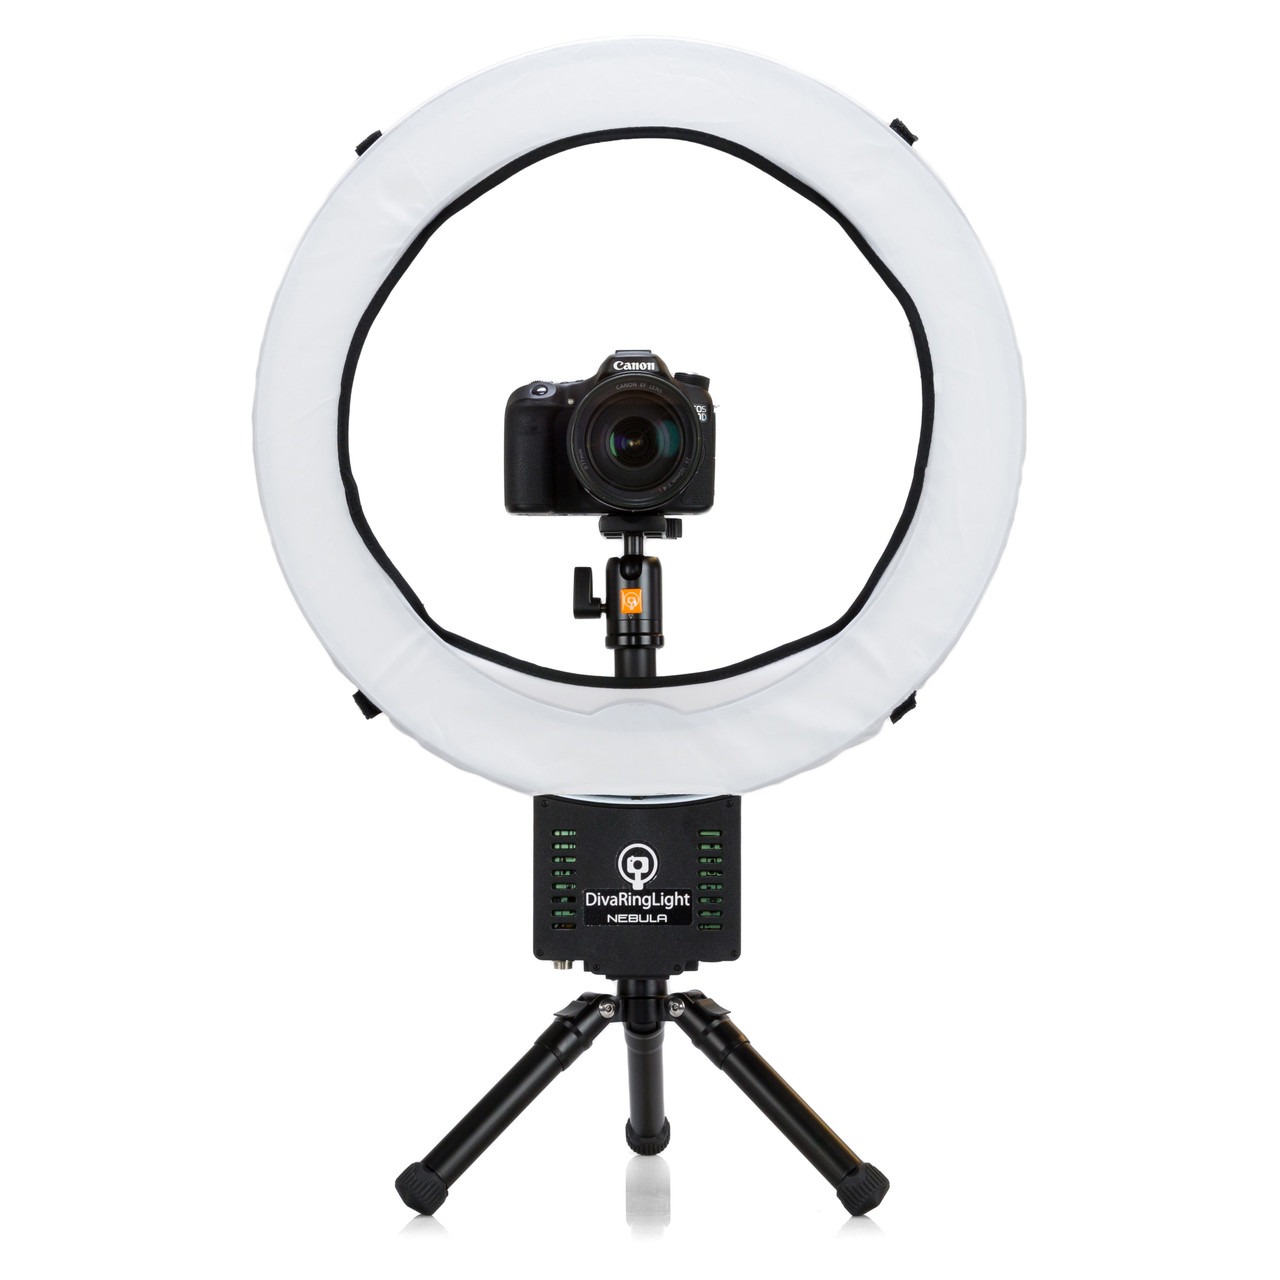 Diva Ring Light Nebula LED Photo//Video light with Video Tripod